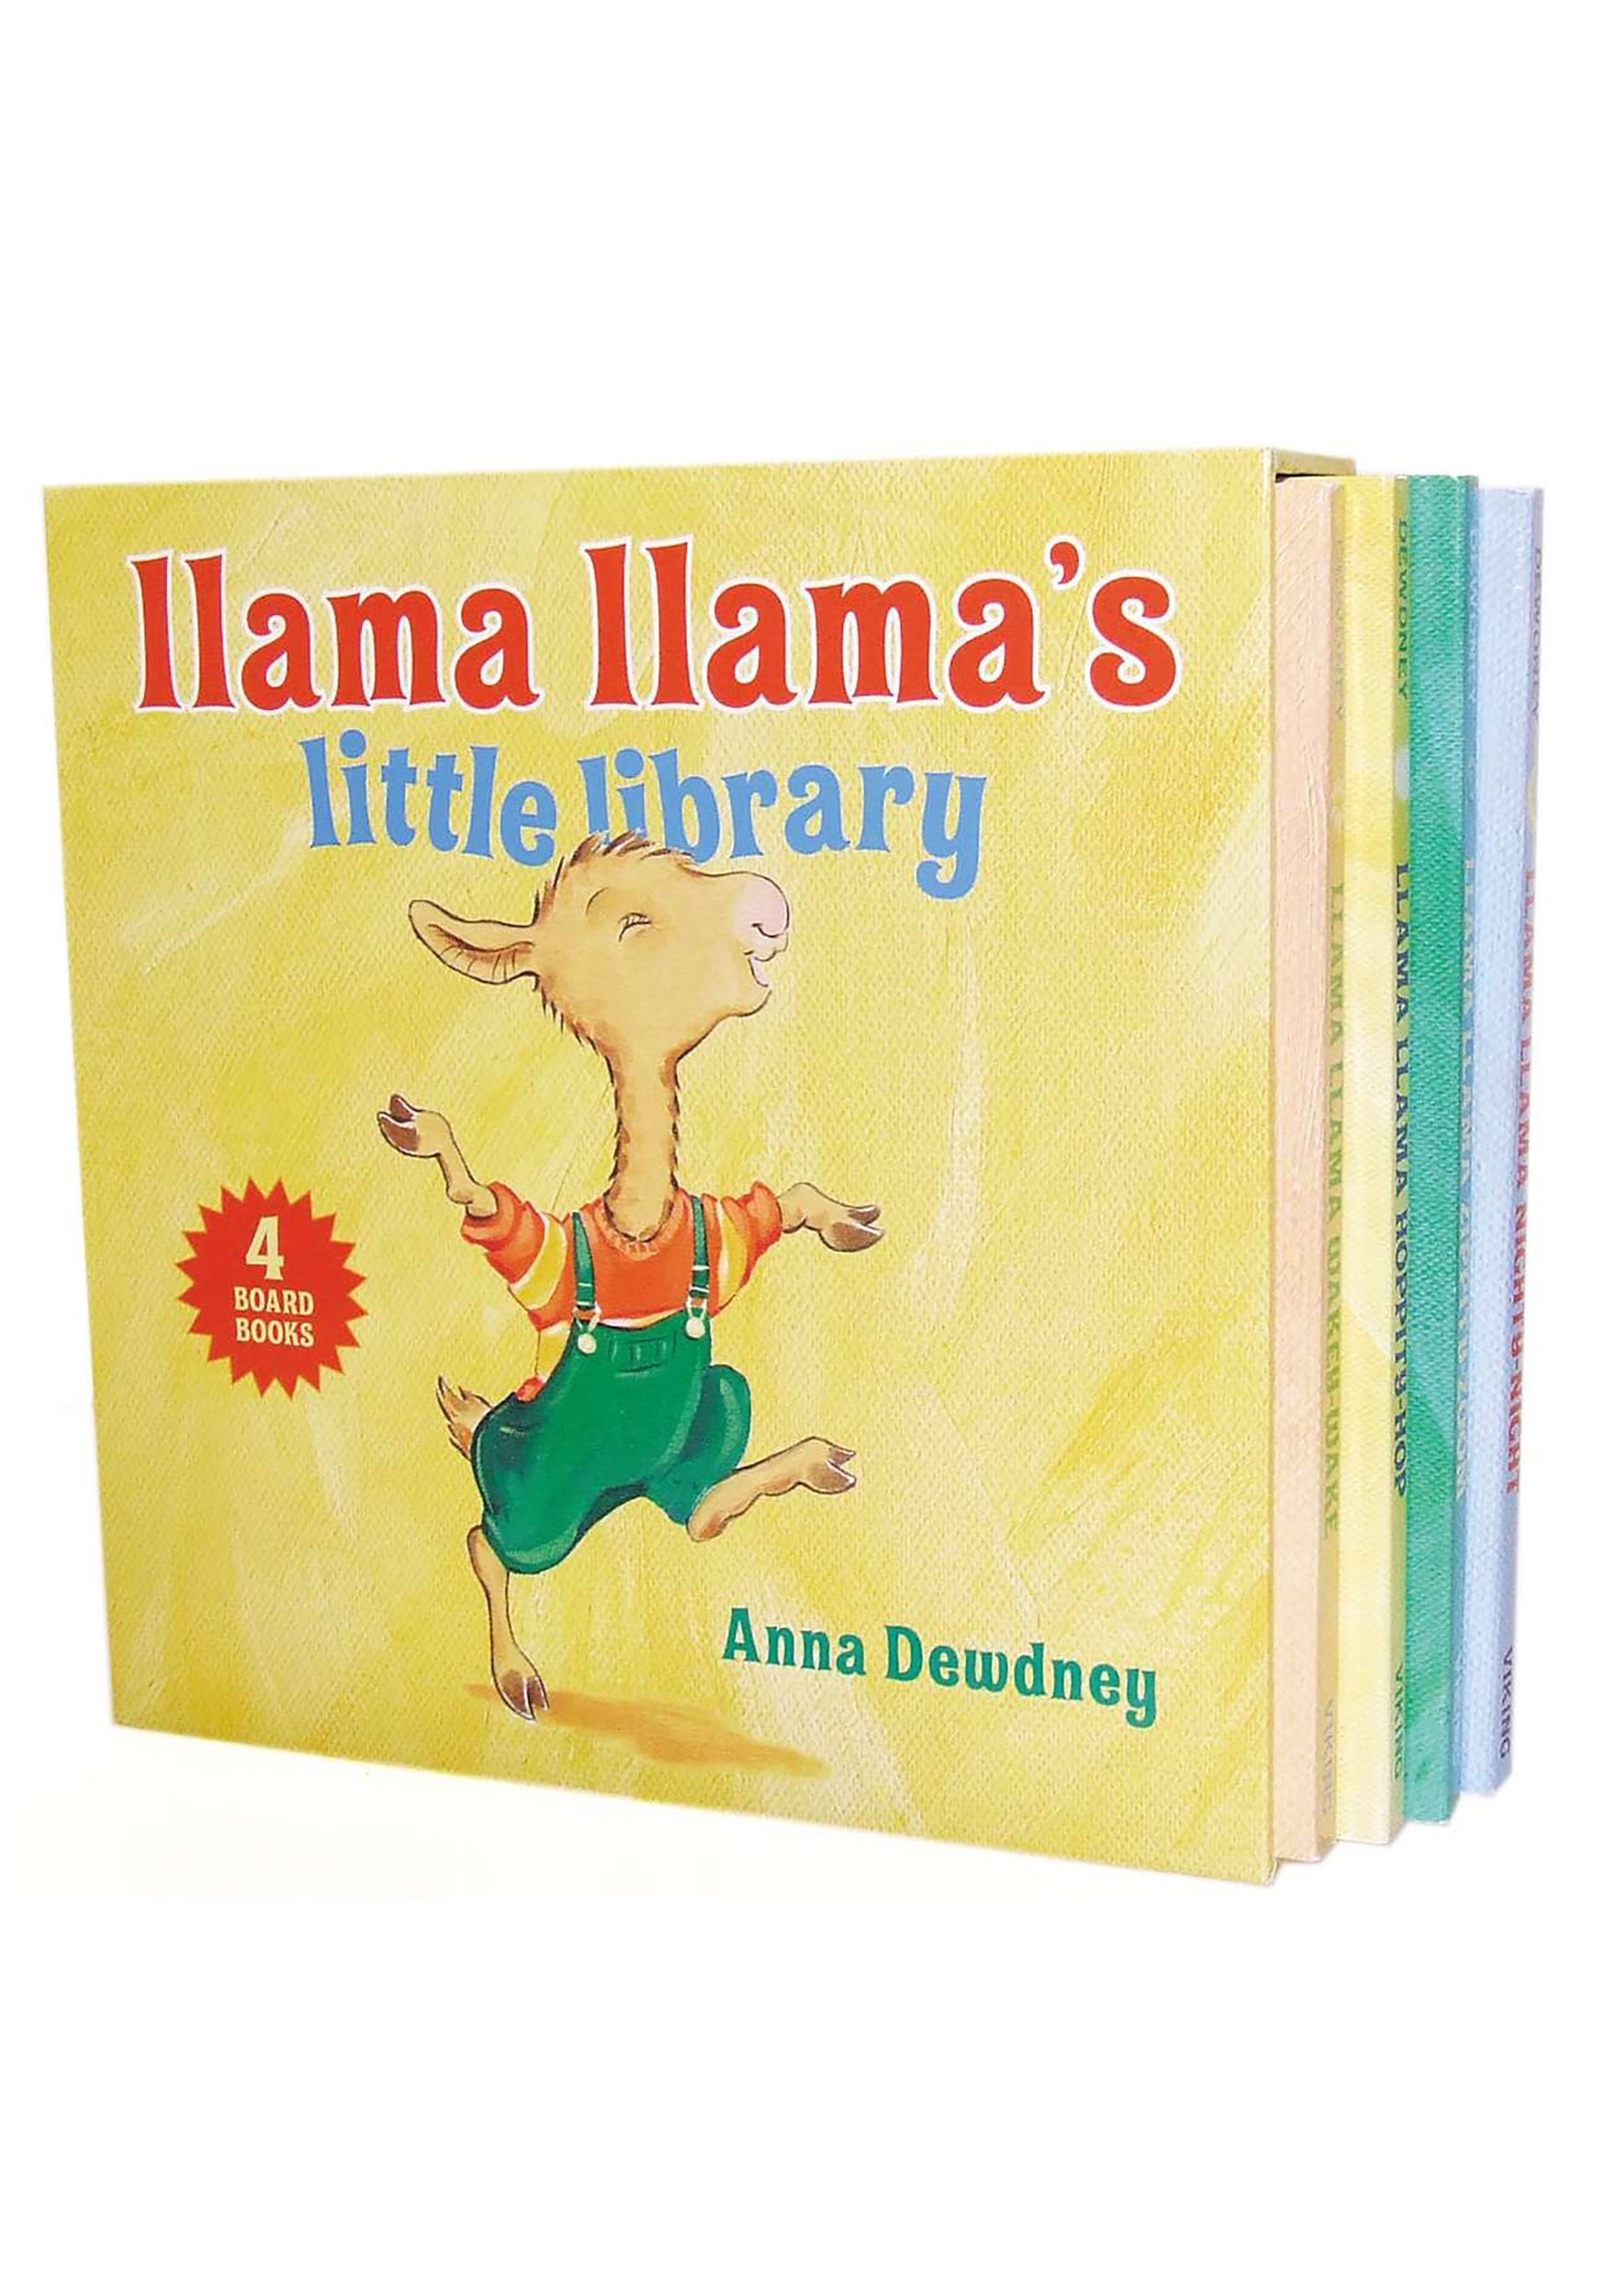 The Llama Llamas Little Library Book Set